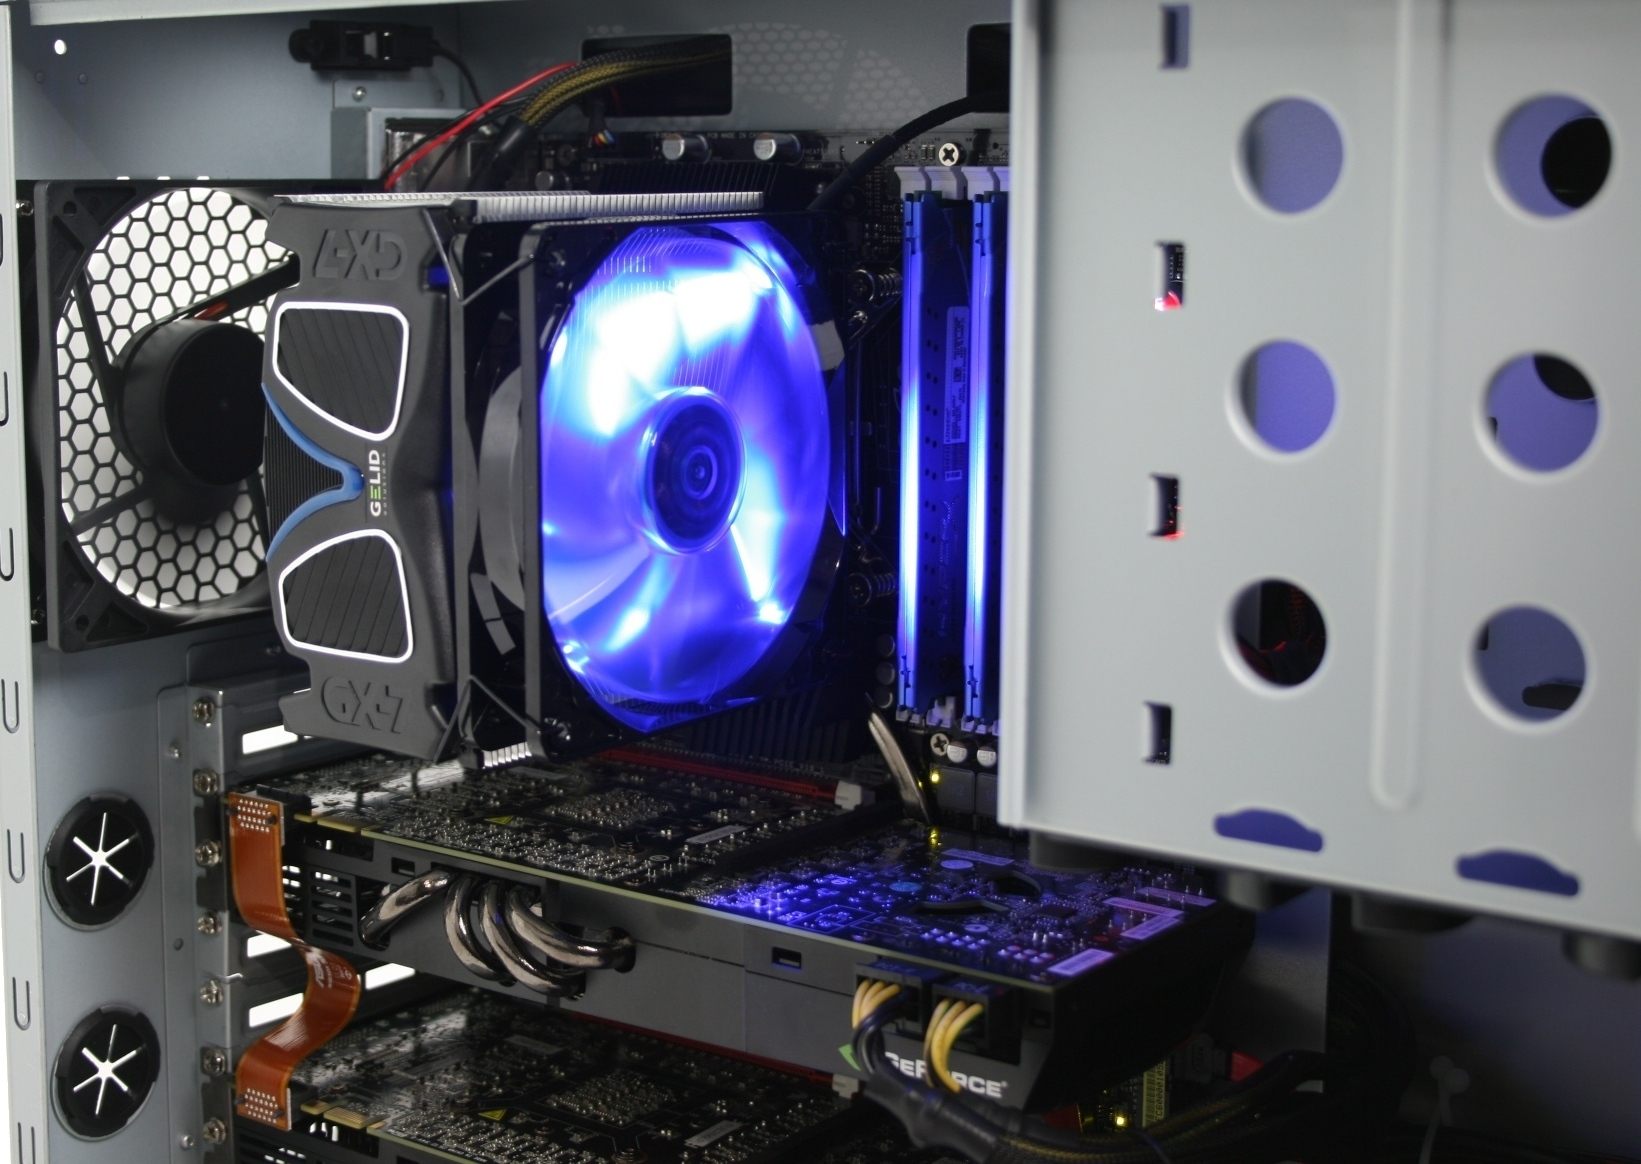 Gelid GX-7 Installed